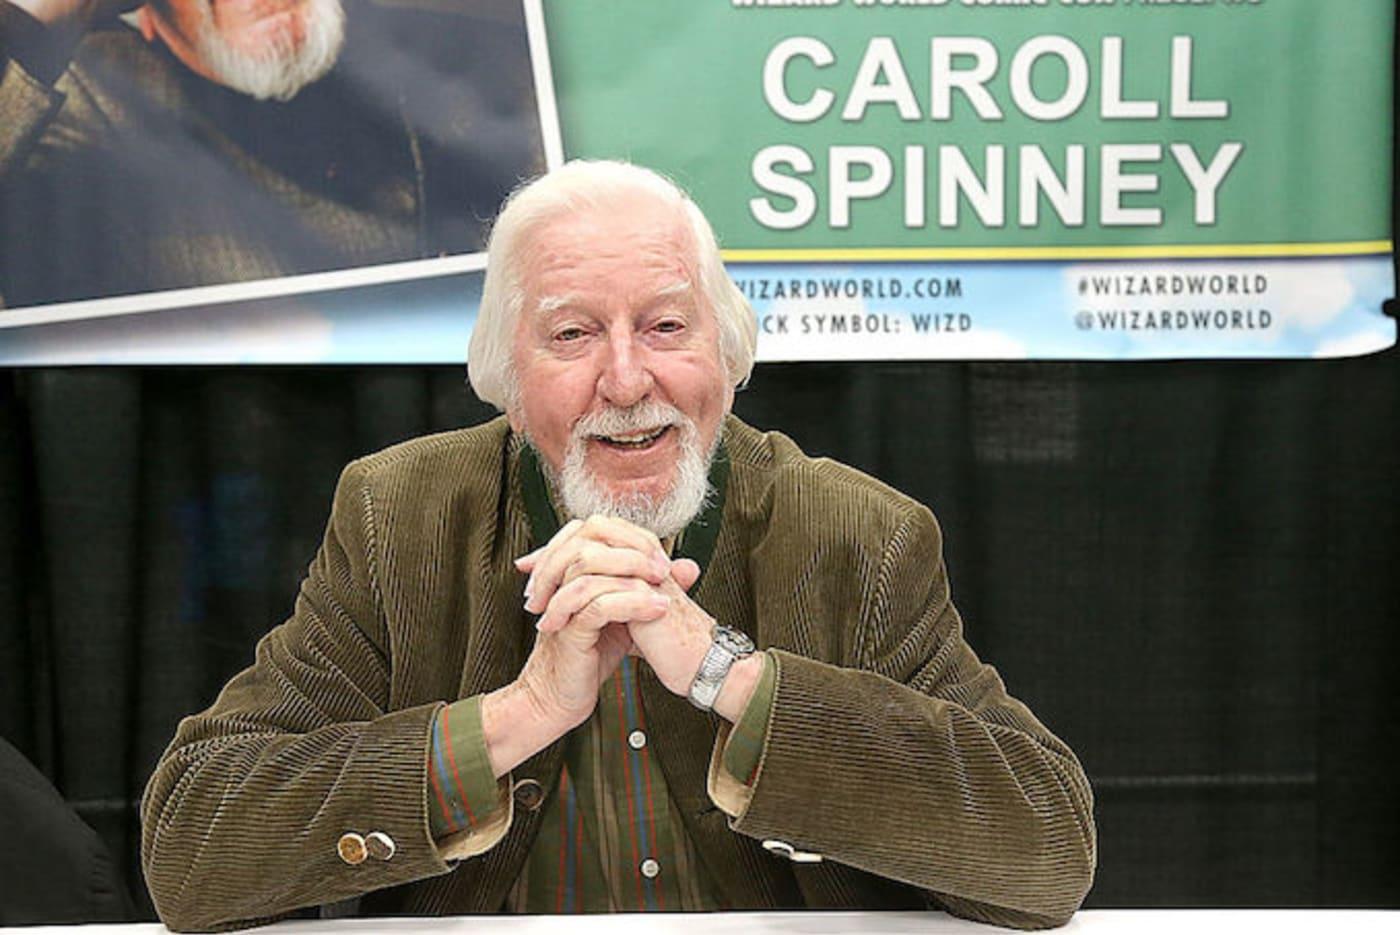 Puppeteer Caroll Spinney